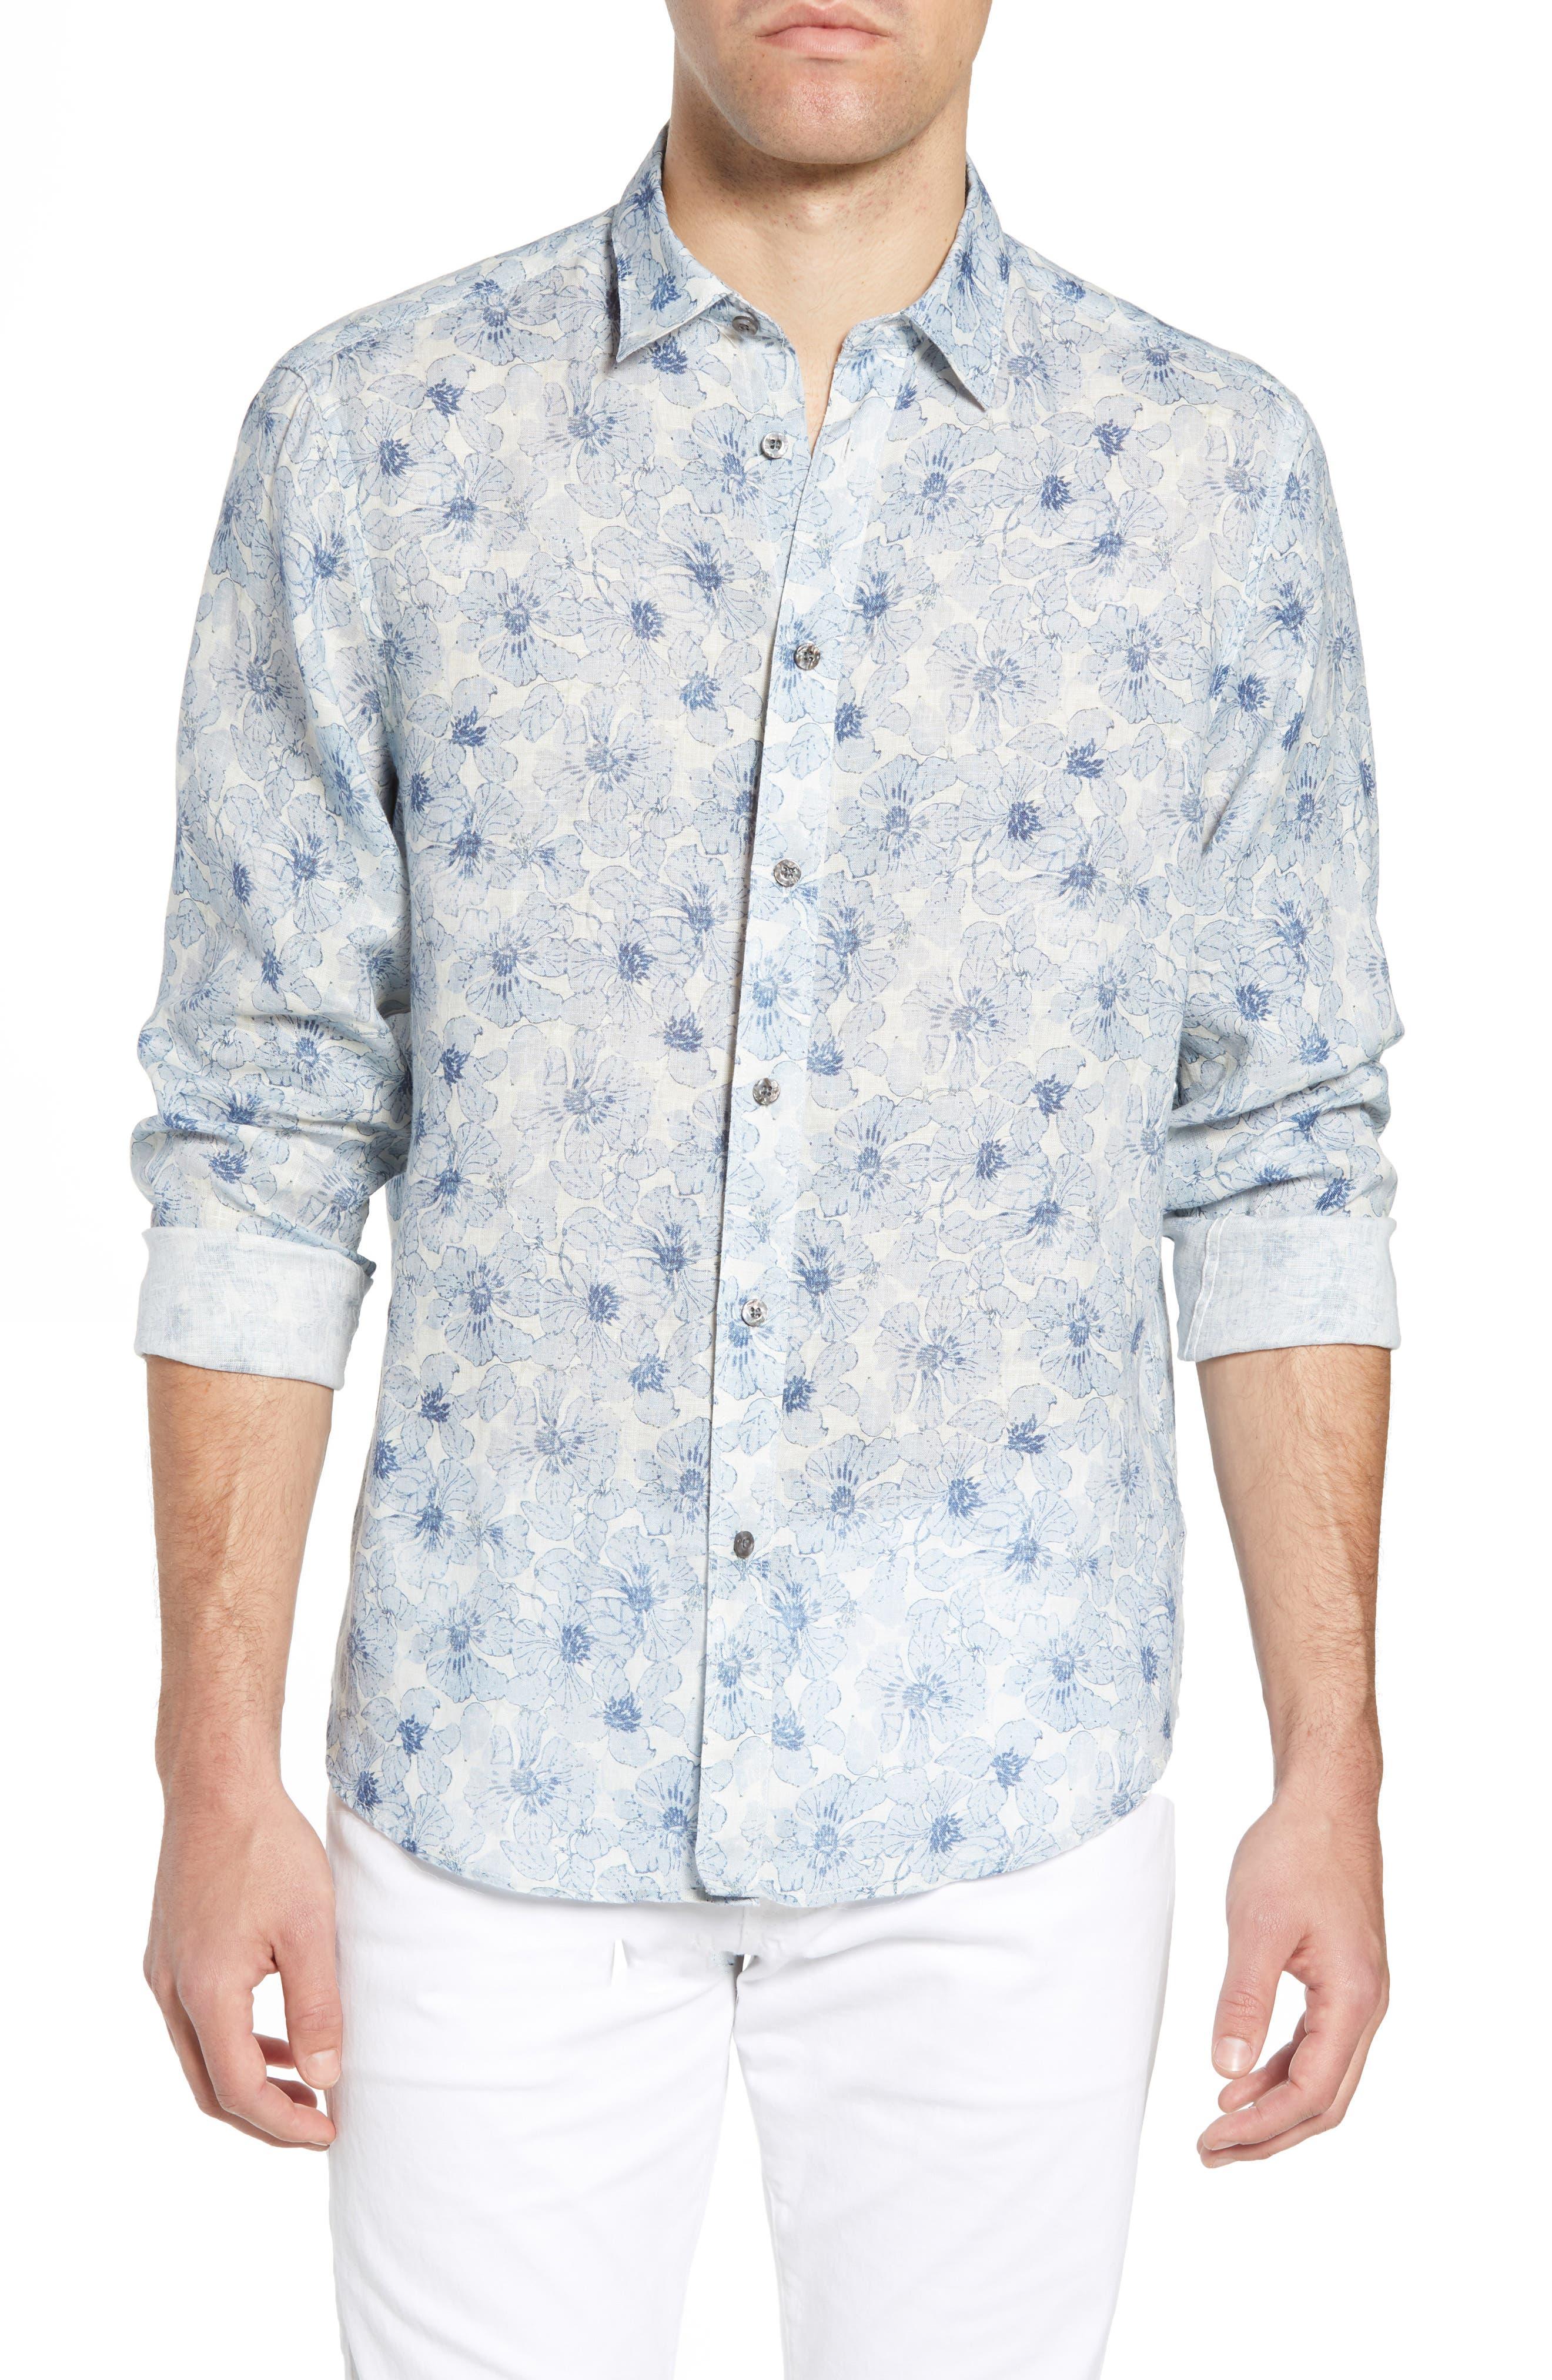 Tavton Regular Fit Floral Linen Sport Shirt,                             Main thumbnail 1, color,                             SKY